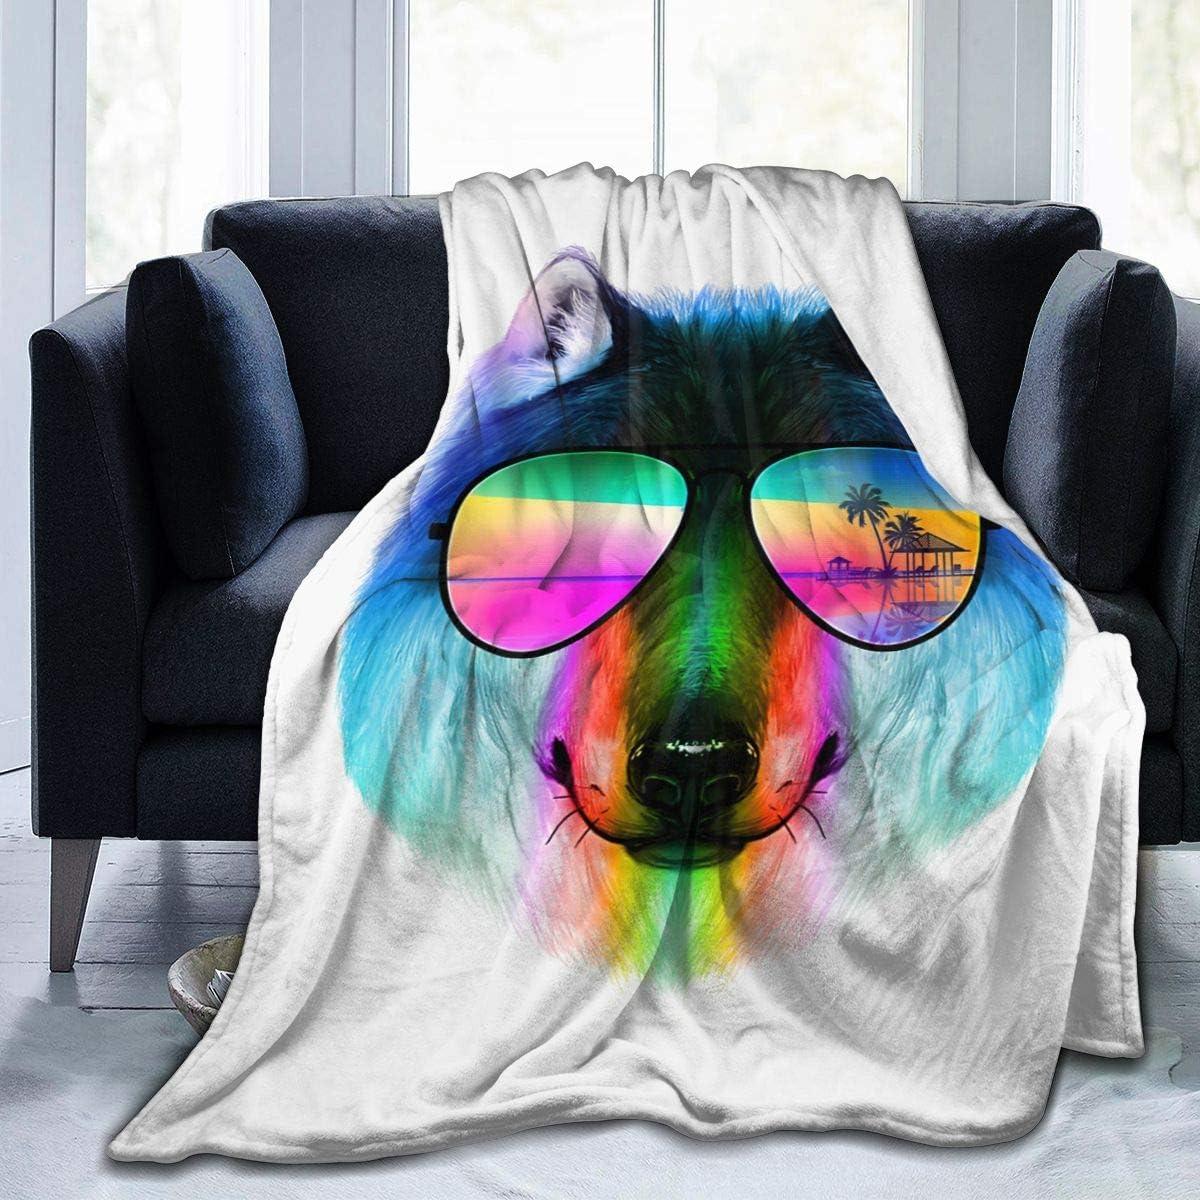 Amazon Com Vickcy Summer Wolf Blanket Super Soft Warm Flannel Blanket For Adults Children 80 X60 Kitchen Dining